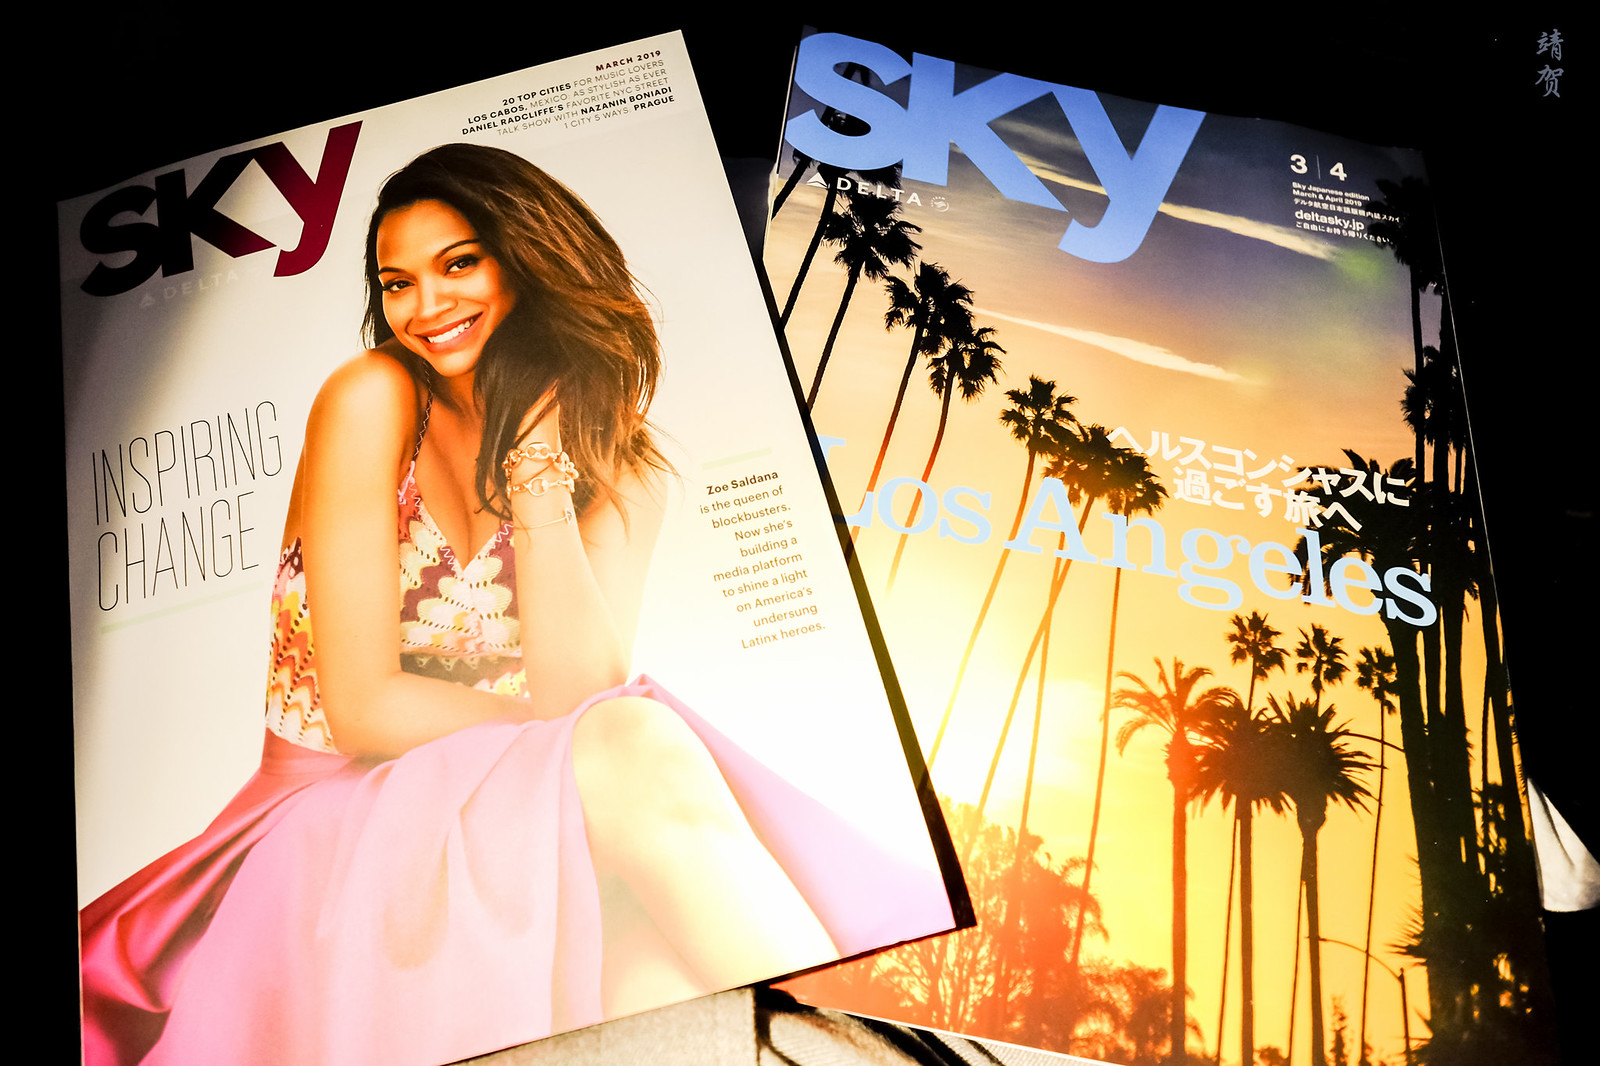 Sky inflight magazines